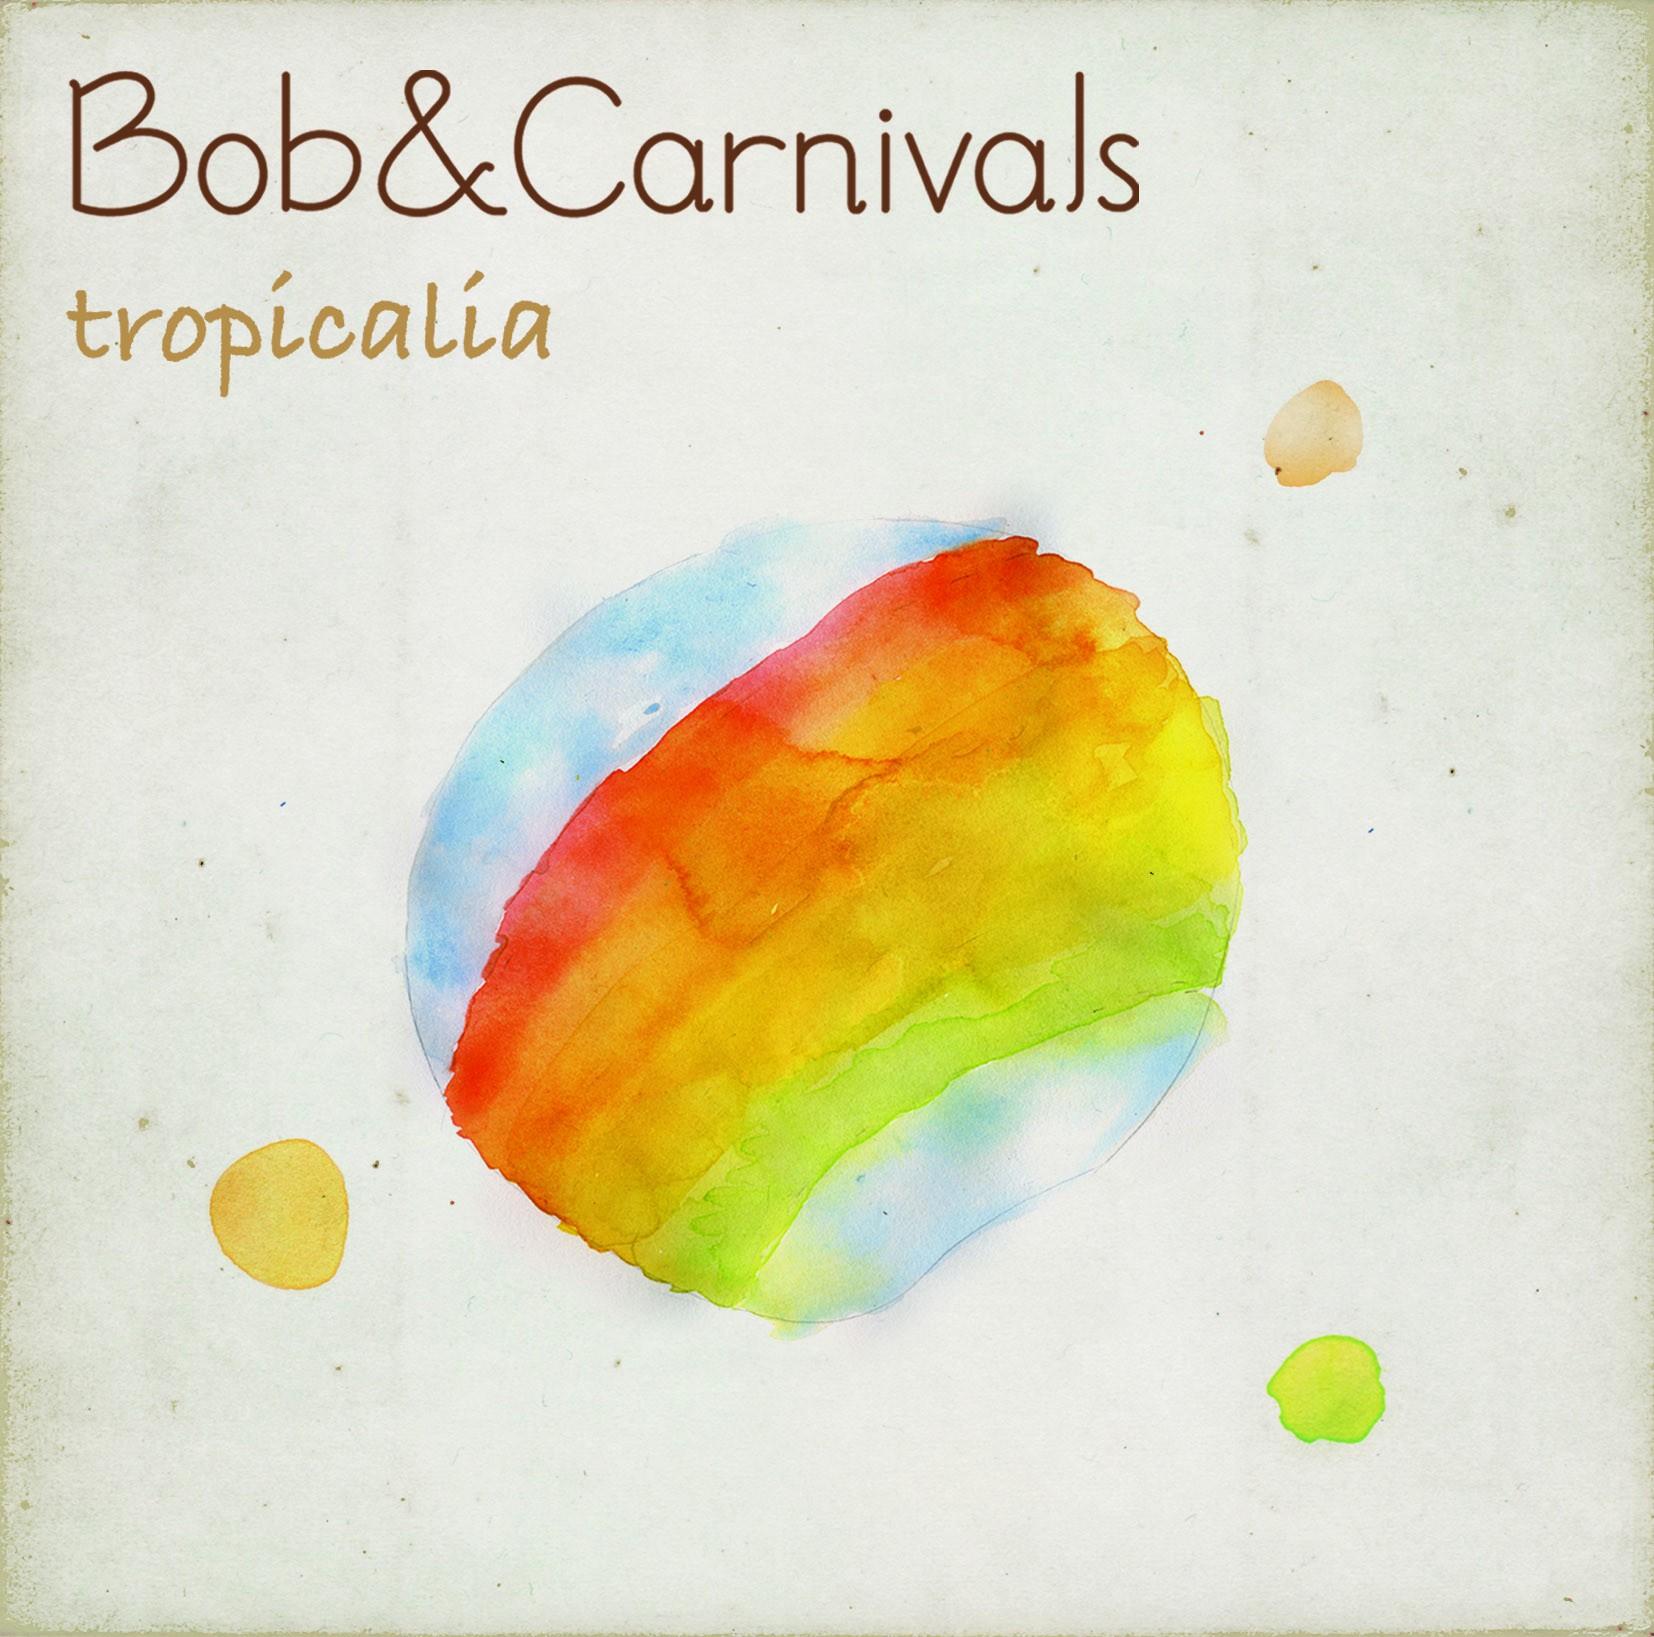 Bob&Carnivals tropicalia